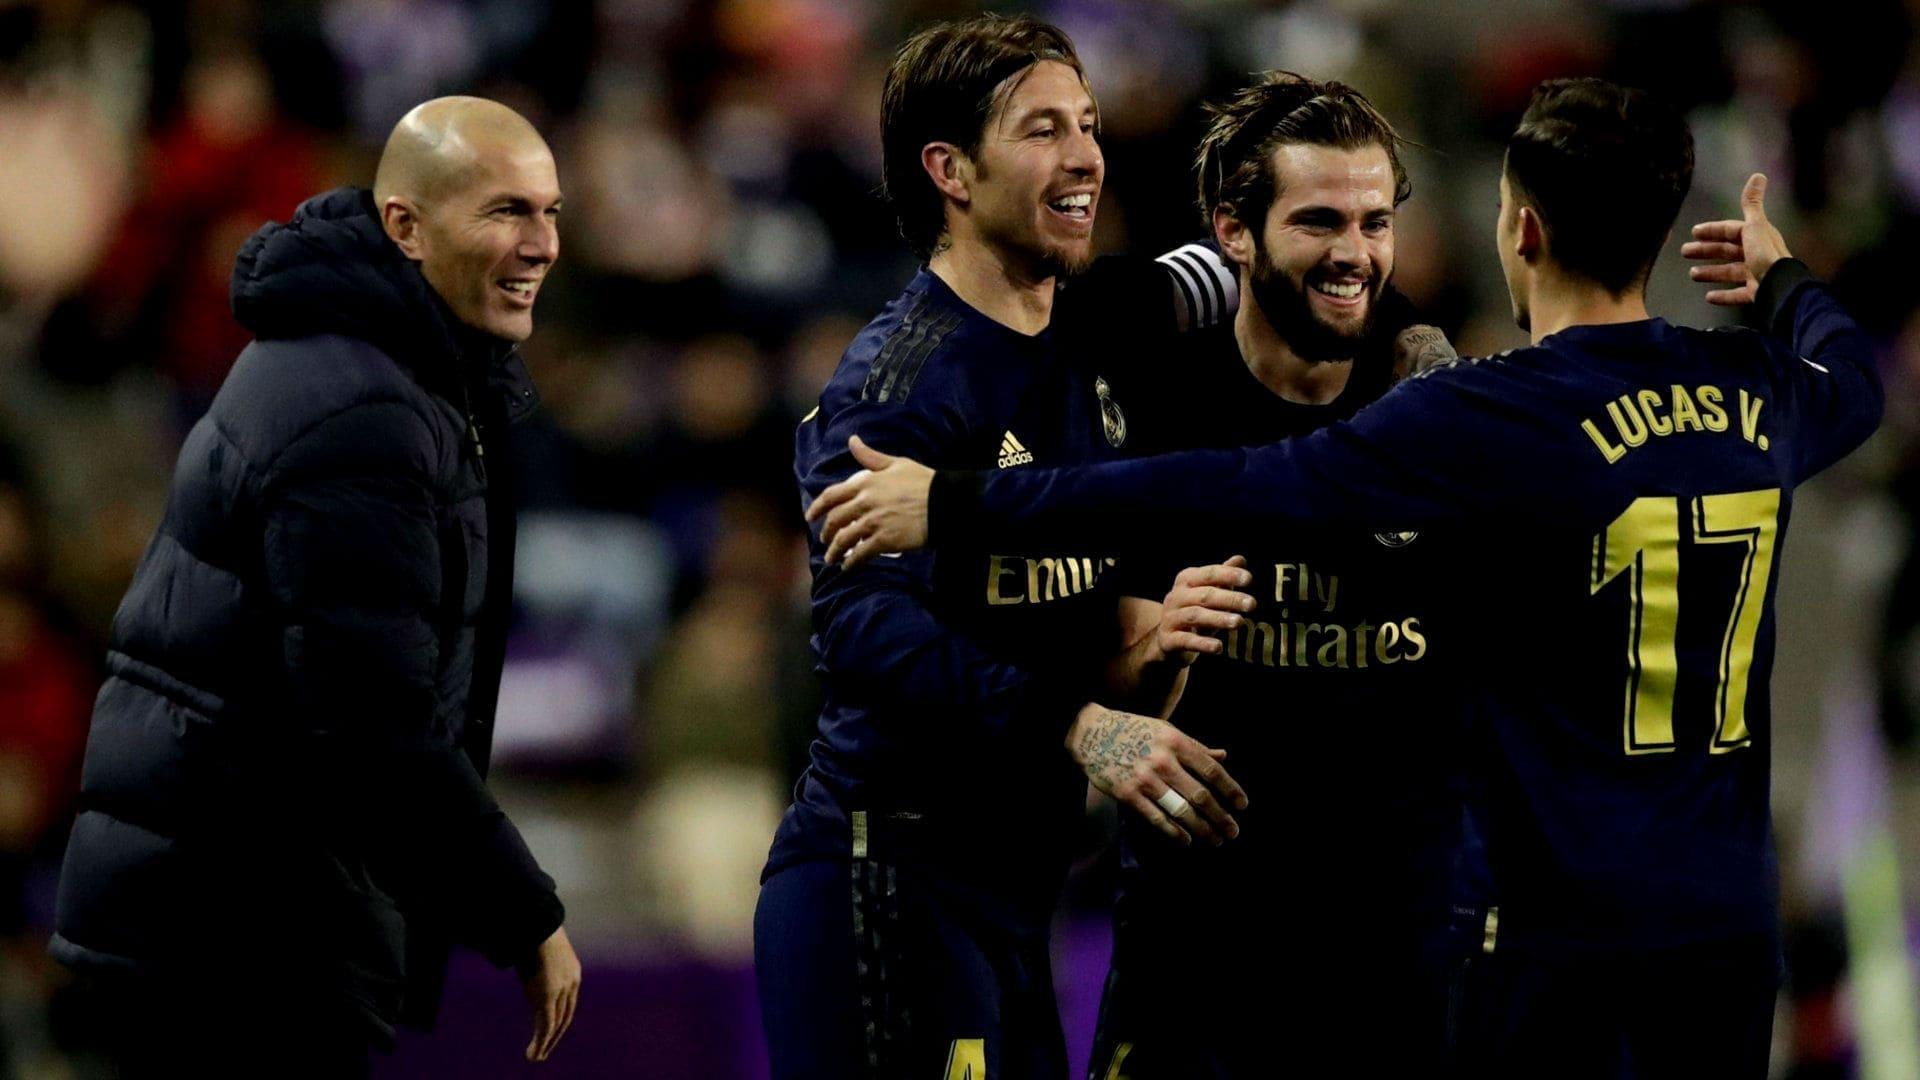 Реал Мадрид - Реал Сосьедад прогноз 6 февраля (Реал Мадрид)